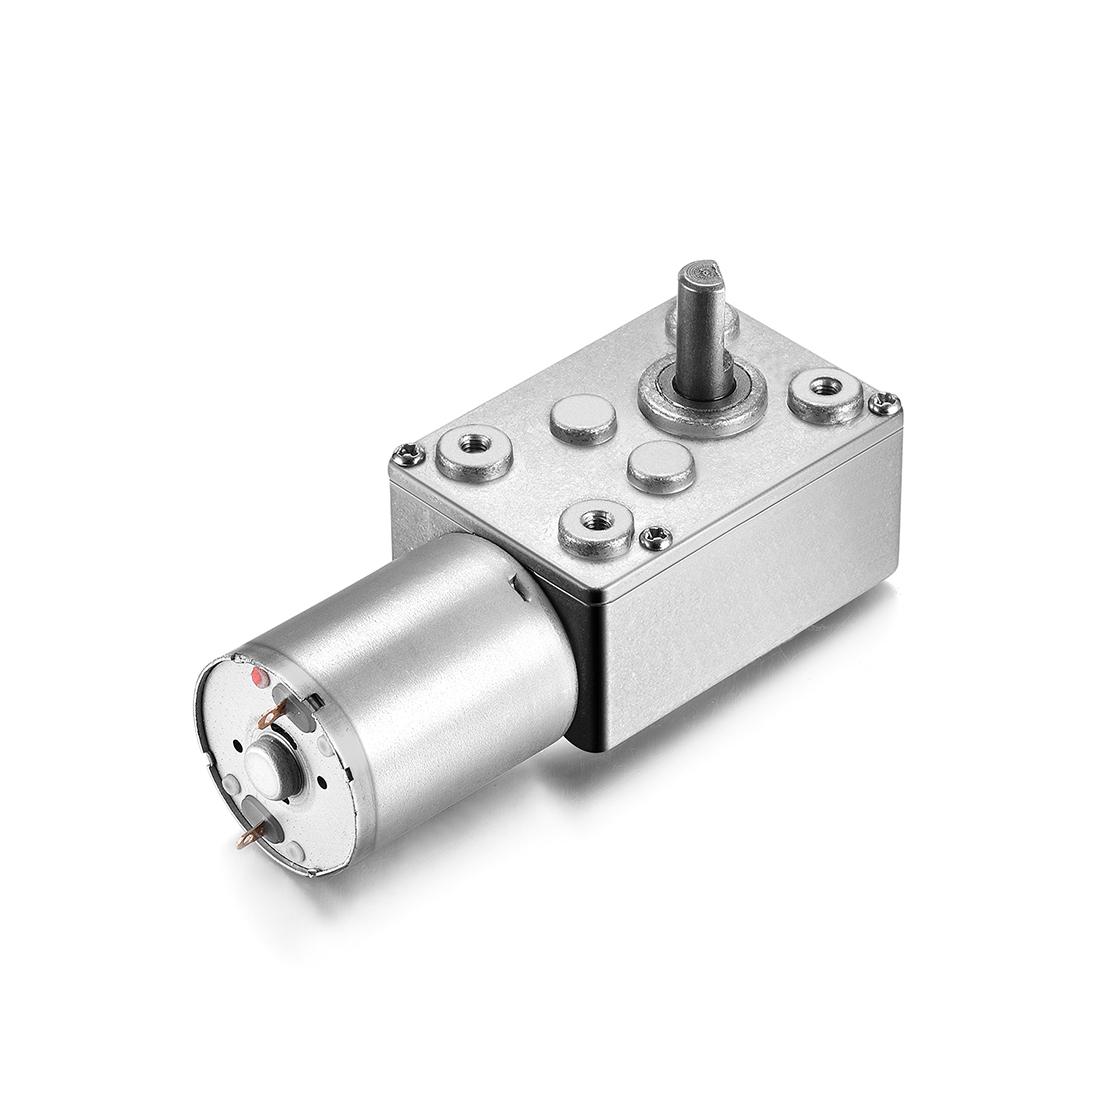 JSX330-370 DC 3V 15RPM 6mm Shaft High Torque Turbine Worm Gear Box Reduction Motor